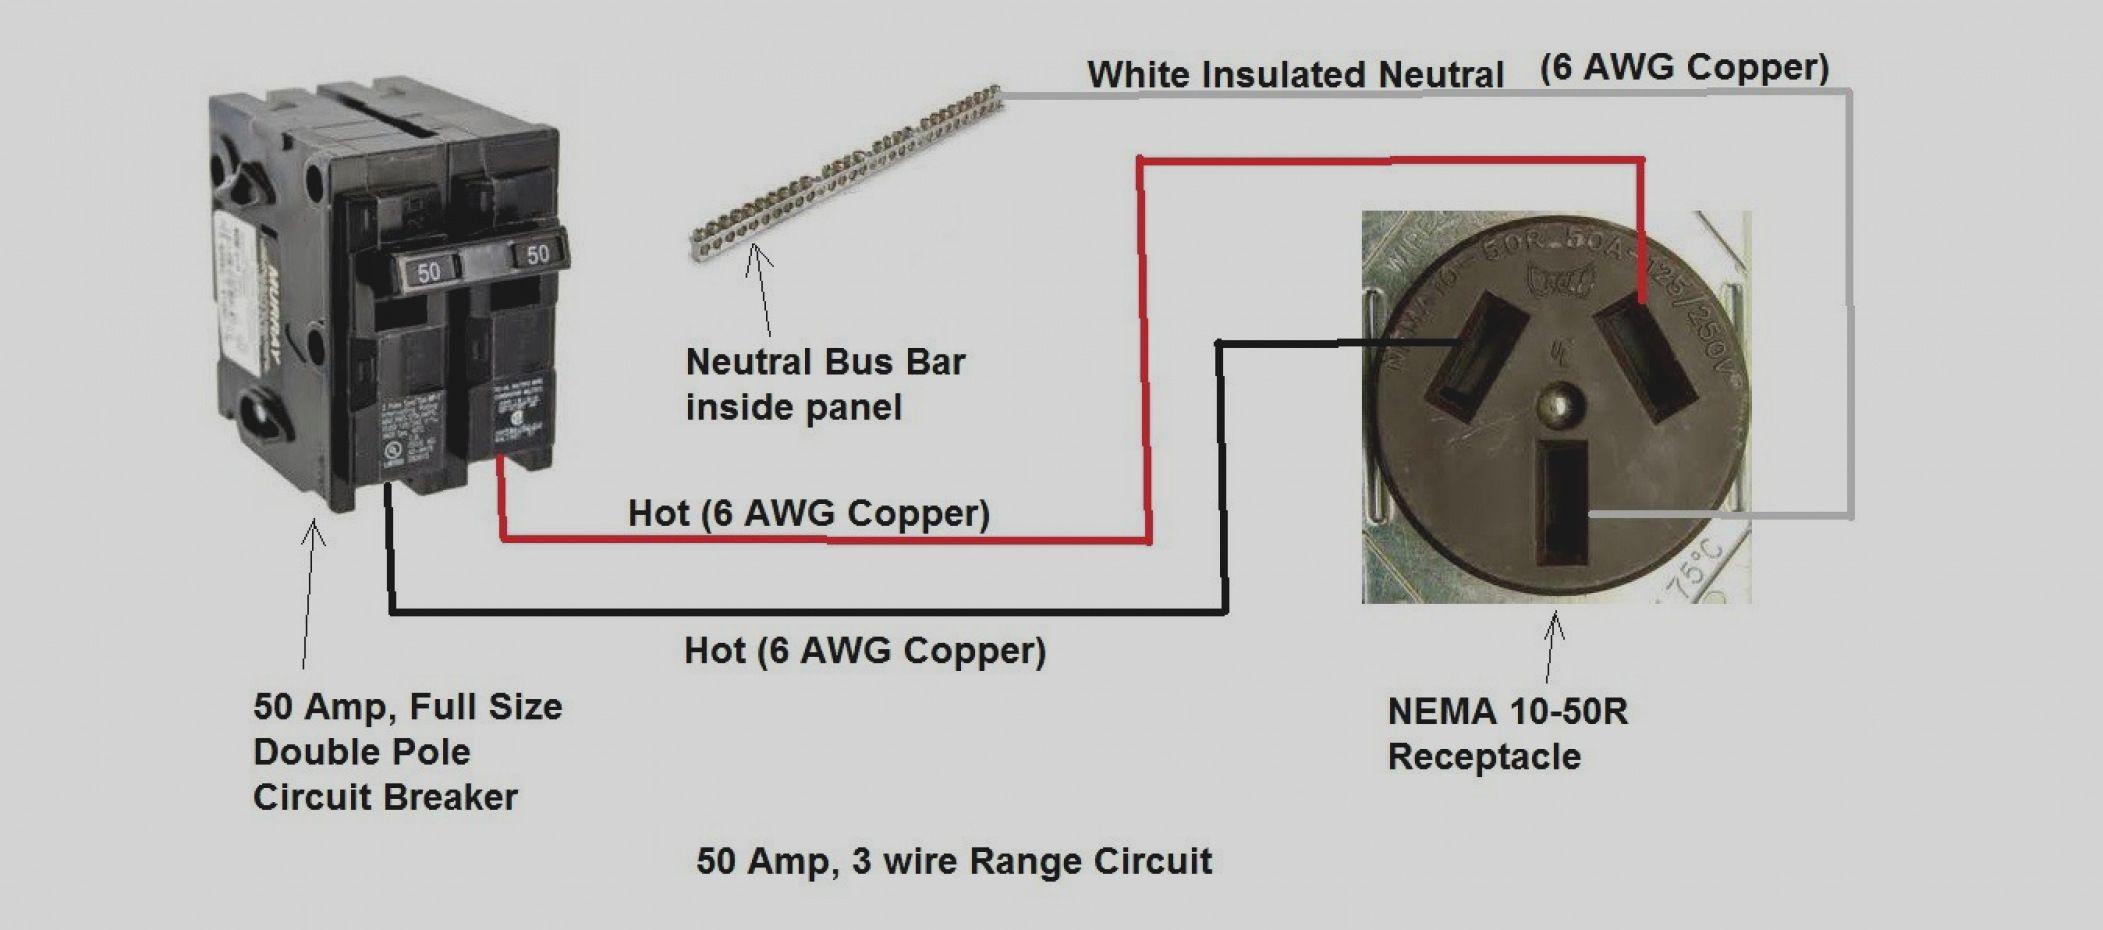 16 Stunning Wiring Diagram For 220 Volt Generator Plug Https Bacamajalah Com 16 Stunning Wiring Diagram For 220 Volt Ge Dryer Outlet Outlet Wiring Breakers